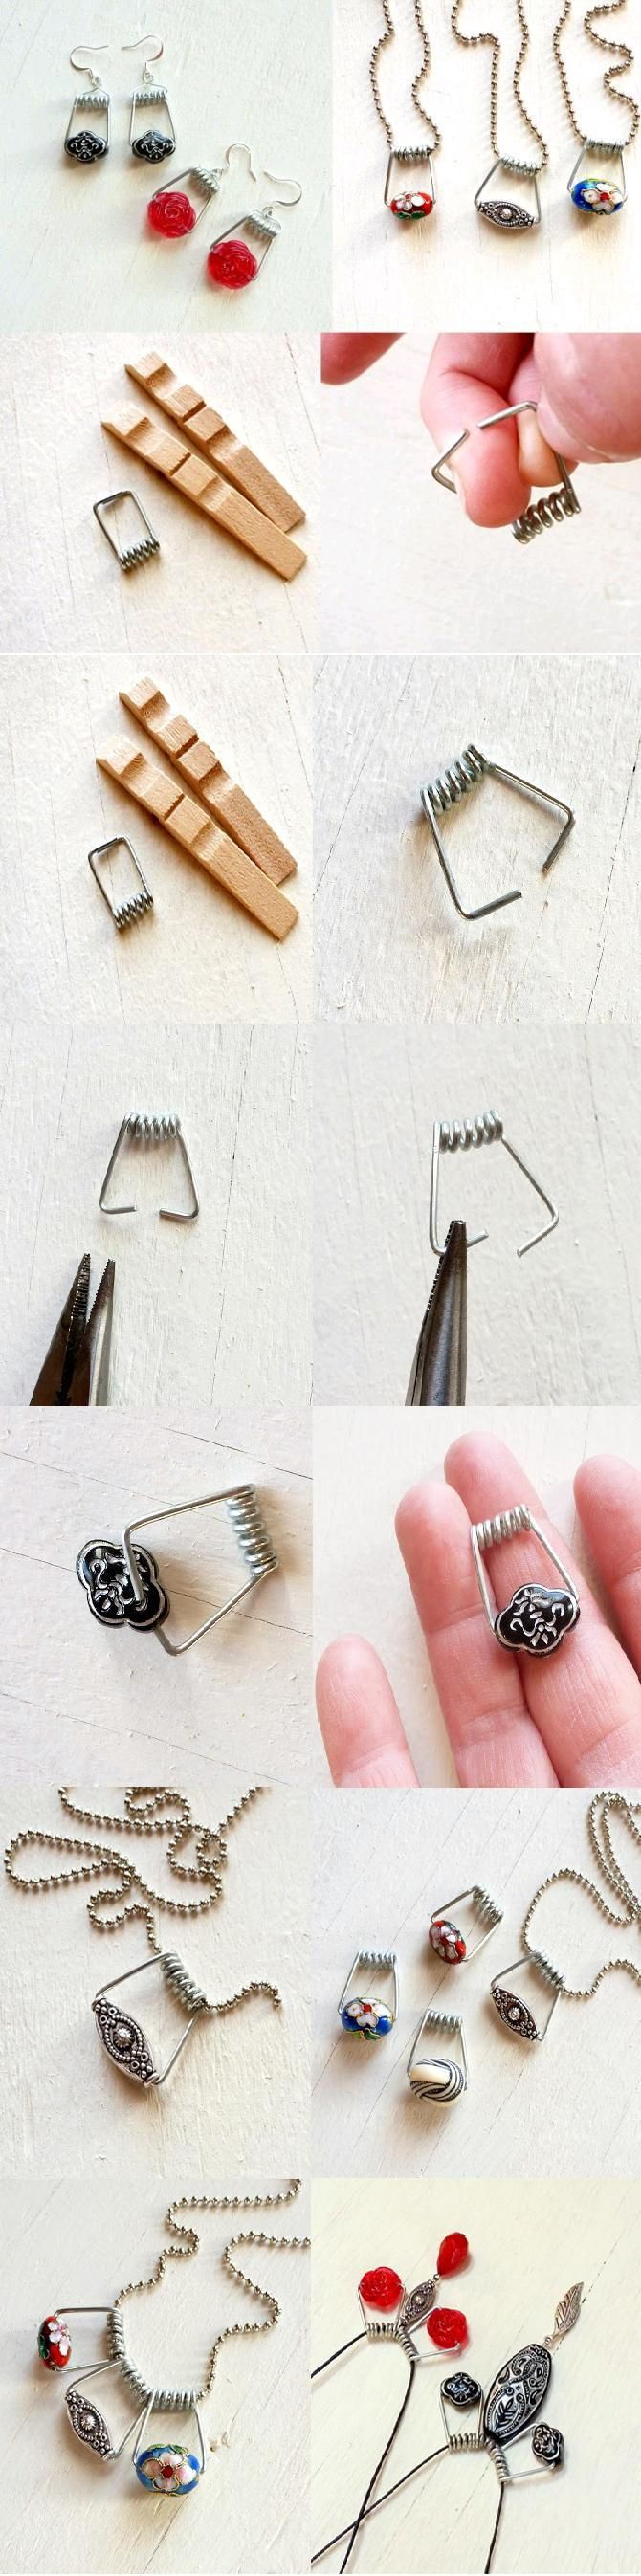 interesting jewelry idea